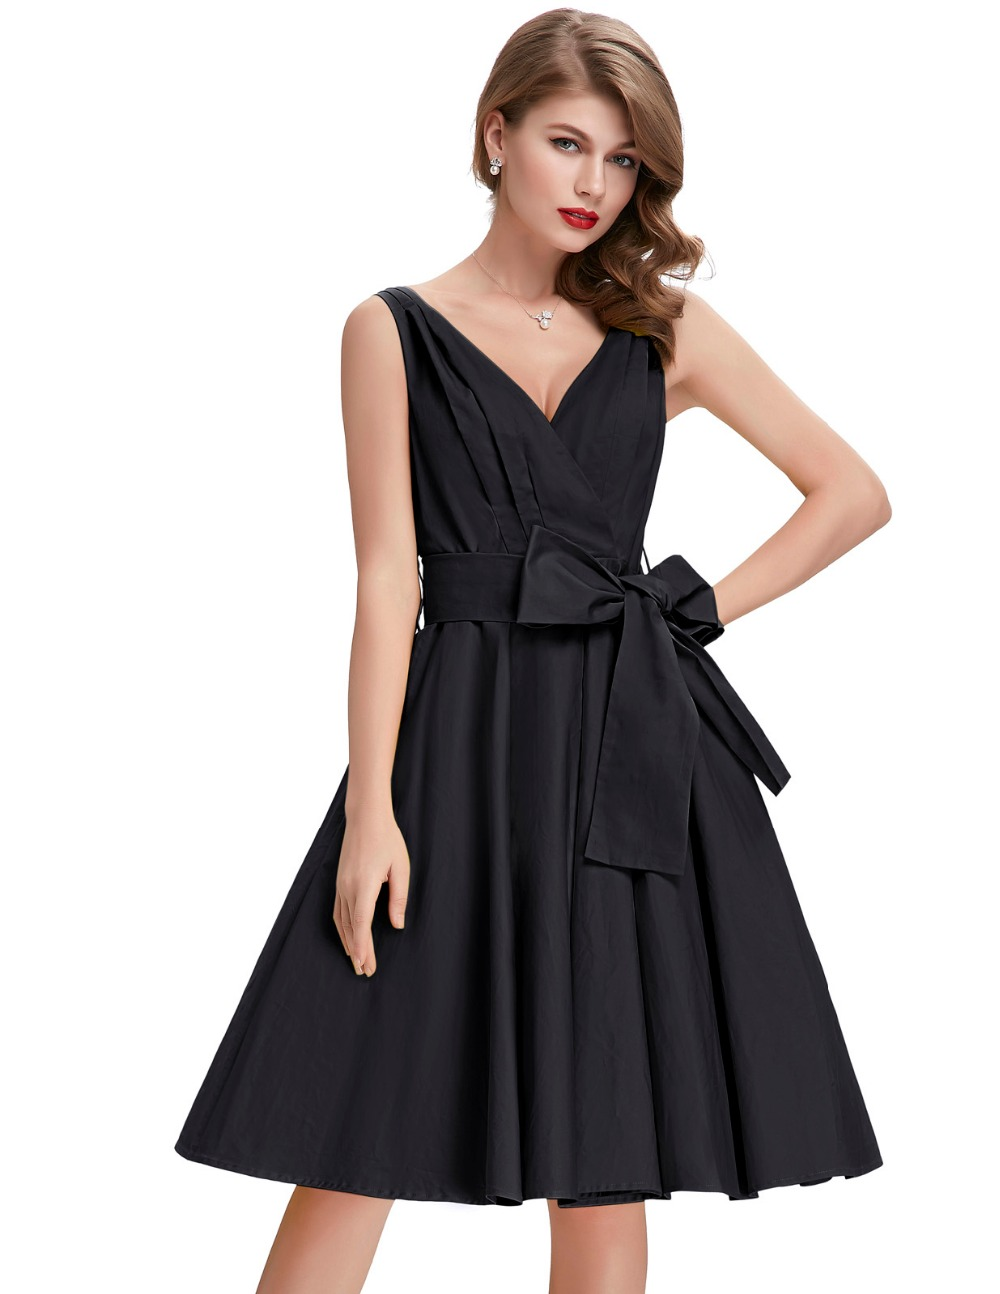 Pinup Vintage Dress Women Summer 50s Retro Dresses Sexy V-neck Sleeveless Vestidos Plus Size Casual Cotton Womens Dress ClothingОдежда и ак�е��уары<br><br><br>Aliexpress